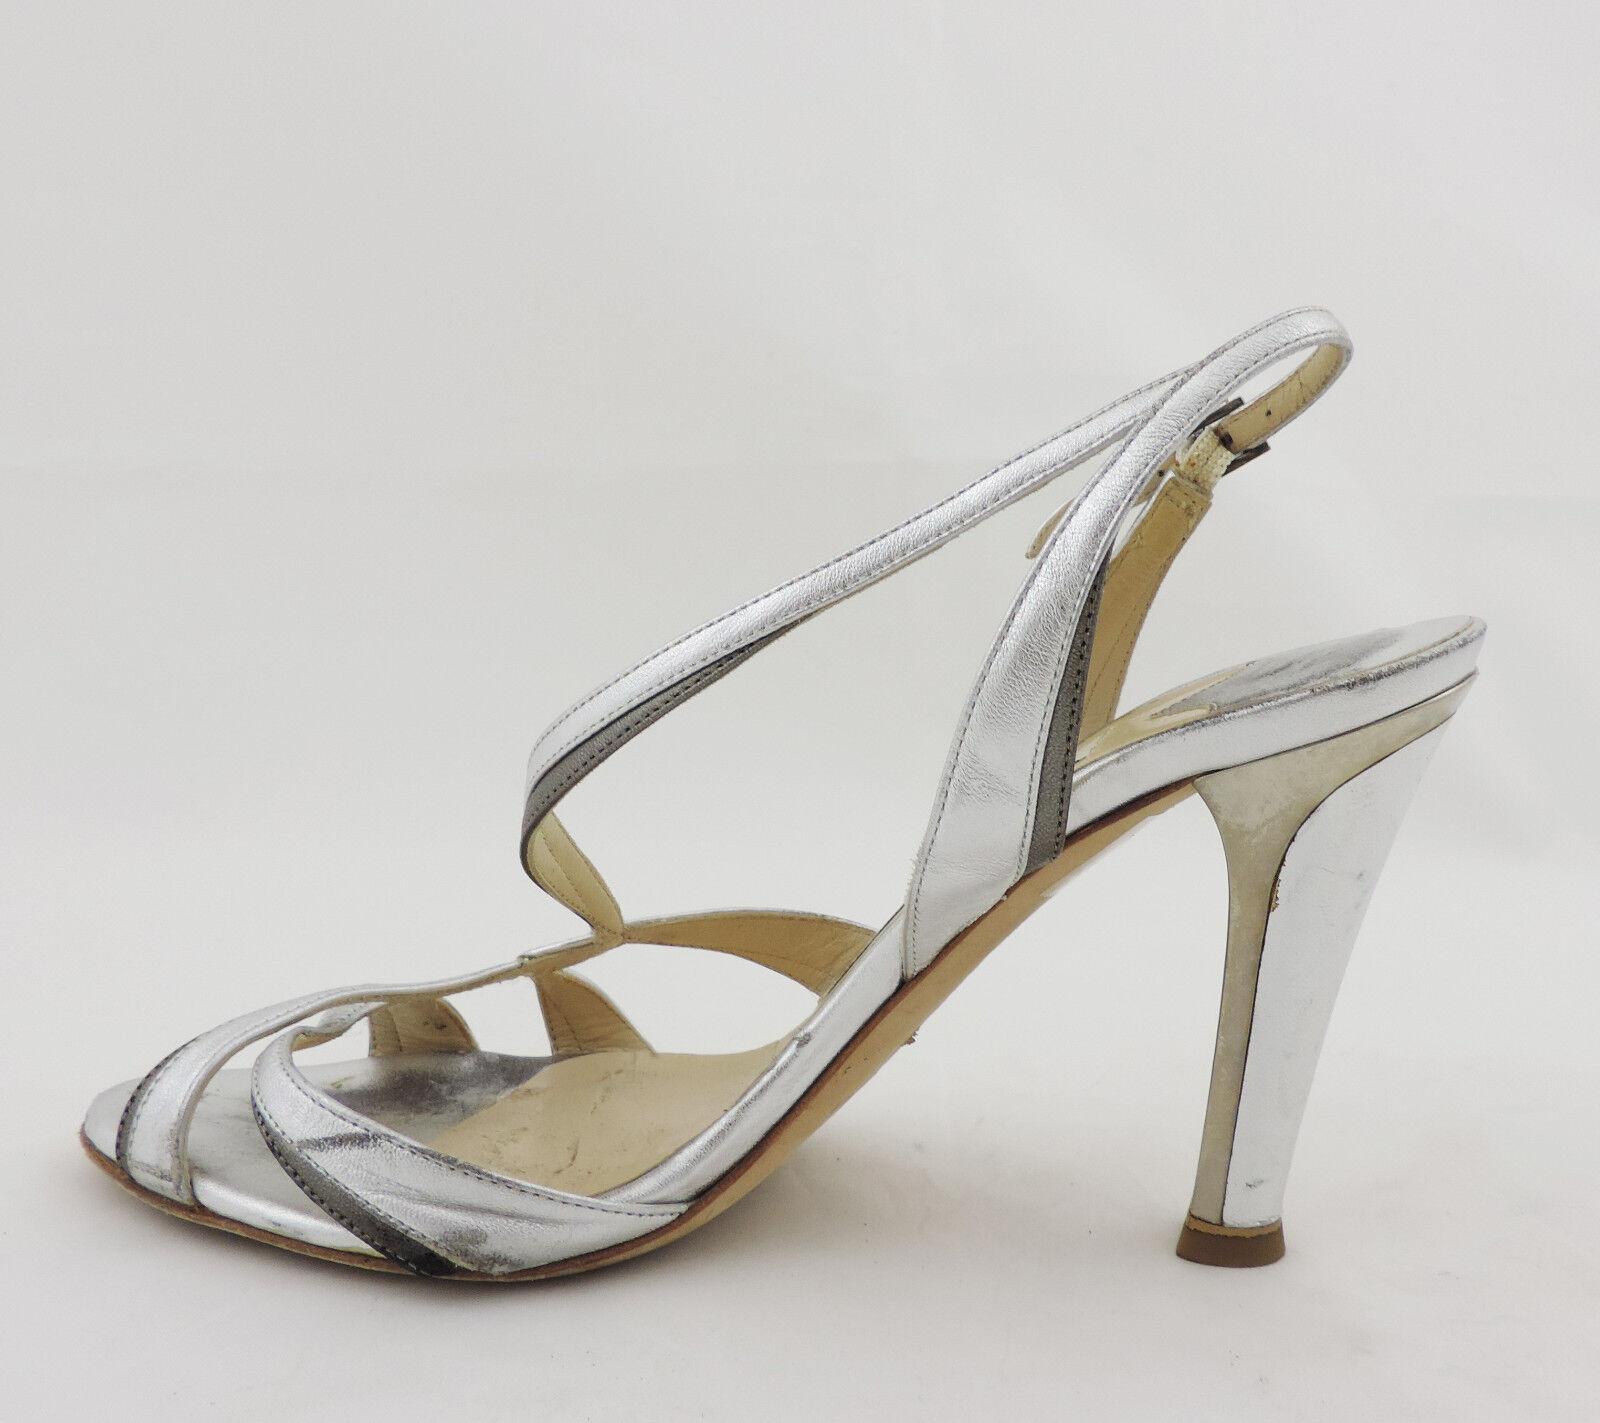 Jimmy high Choo Sandale 36,5 silber high Jimmy heels Leder pumps 29d37b